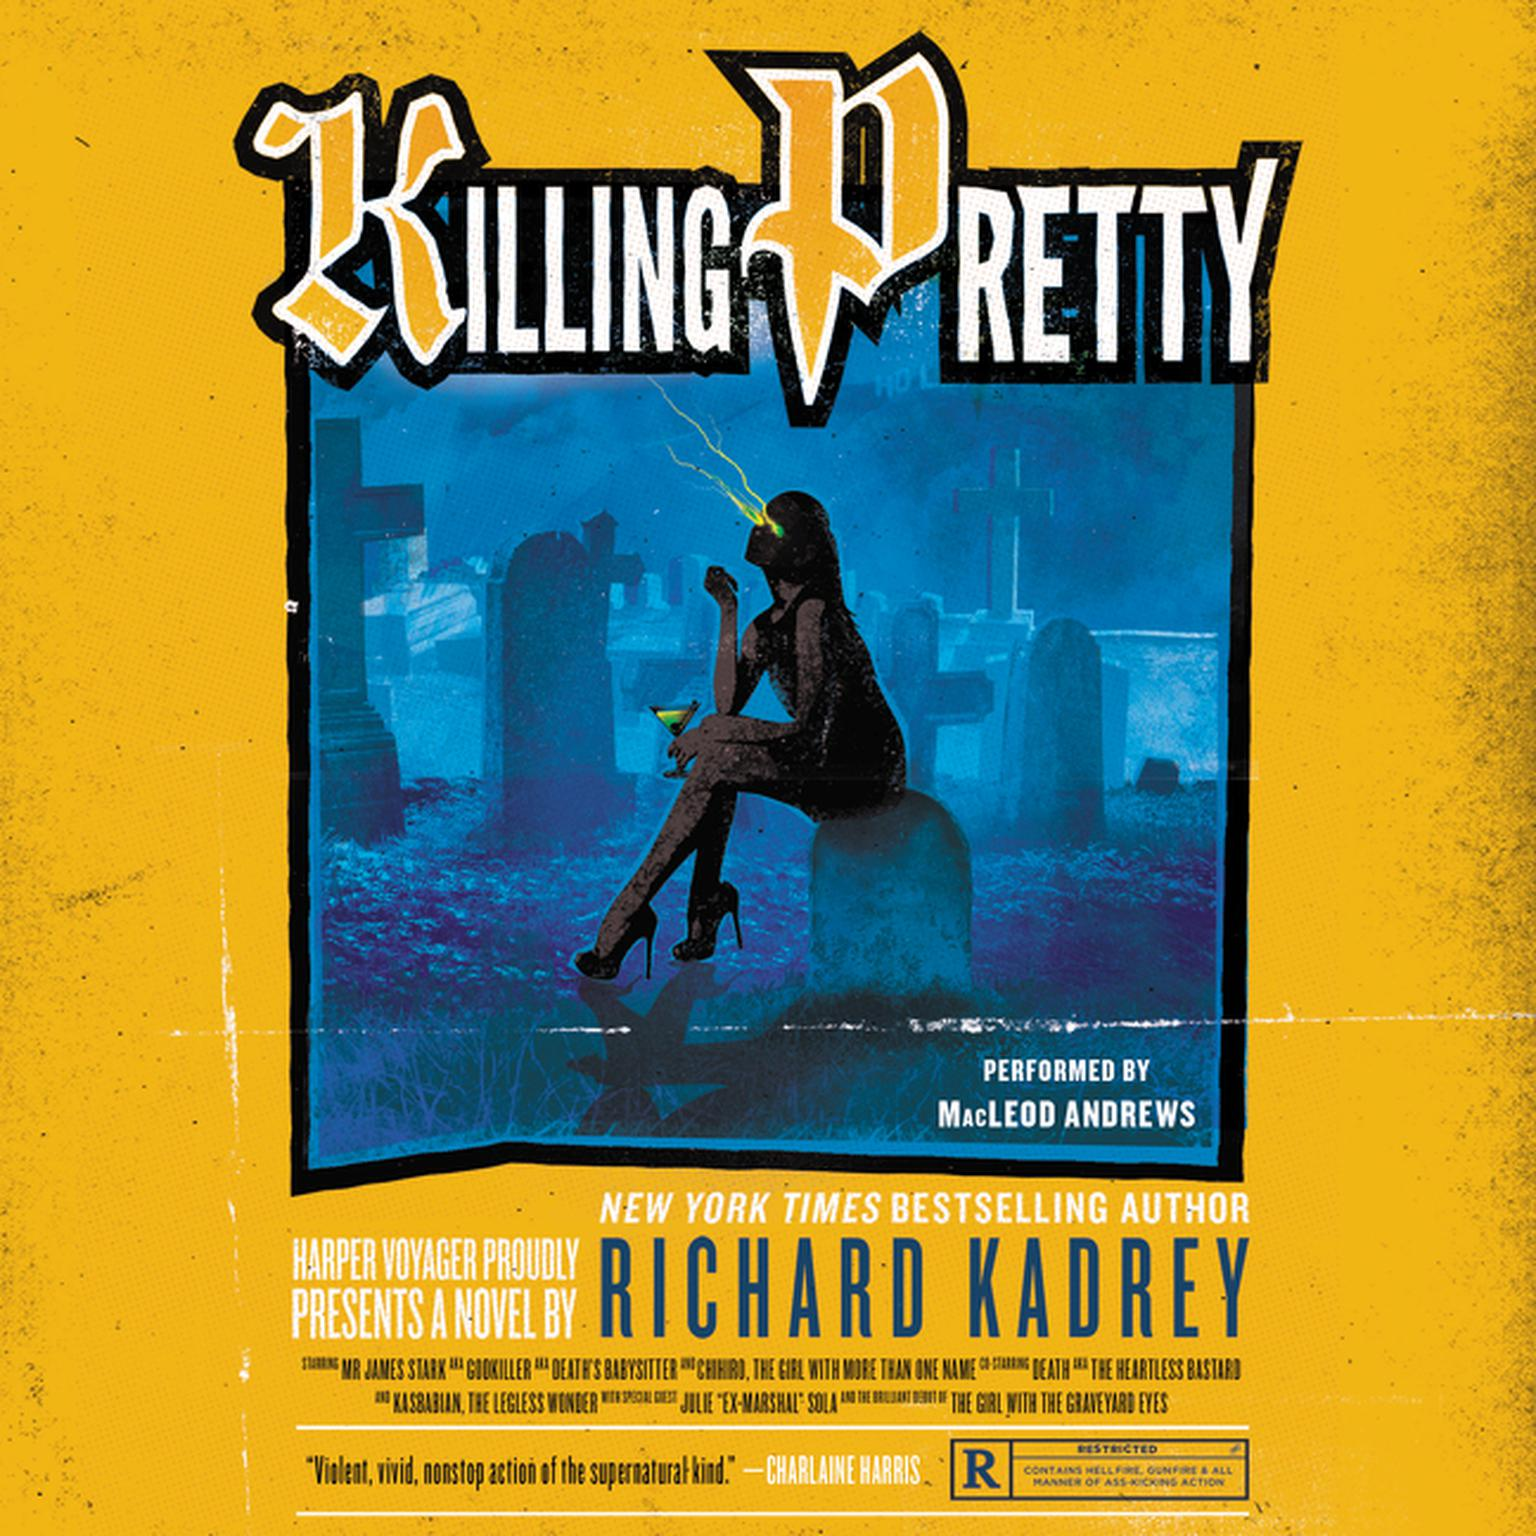 Killing Pretty: A Sandman Slim Novel Audiobook, by Richard Kadrey